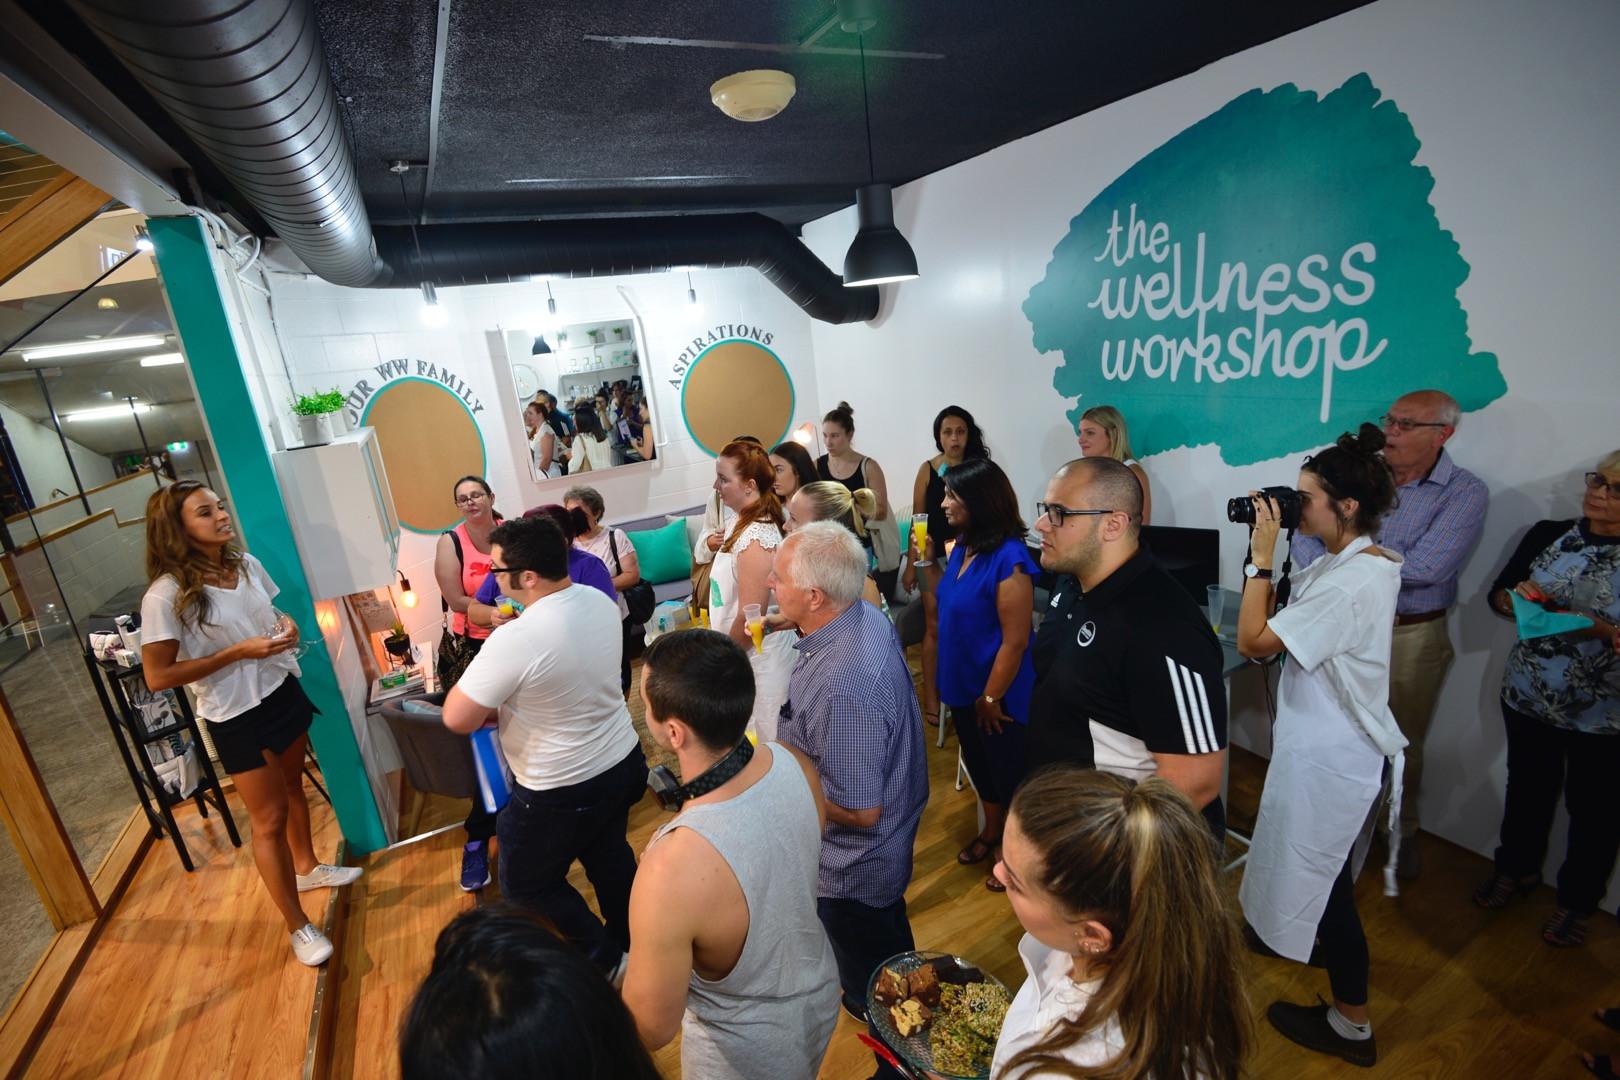 wellnesscentre.jpg